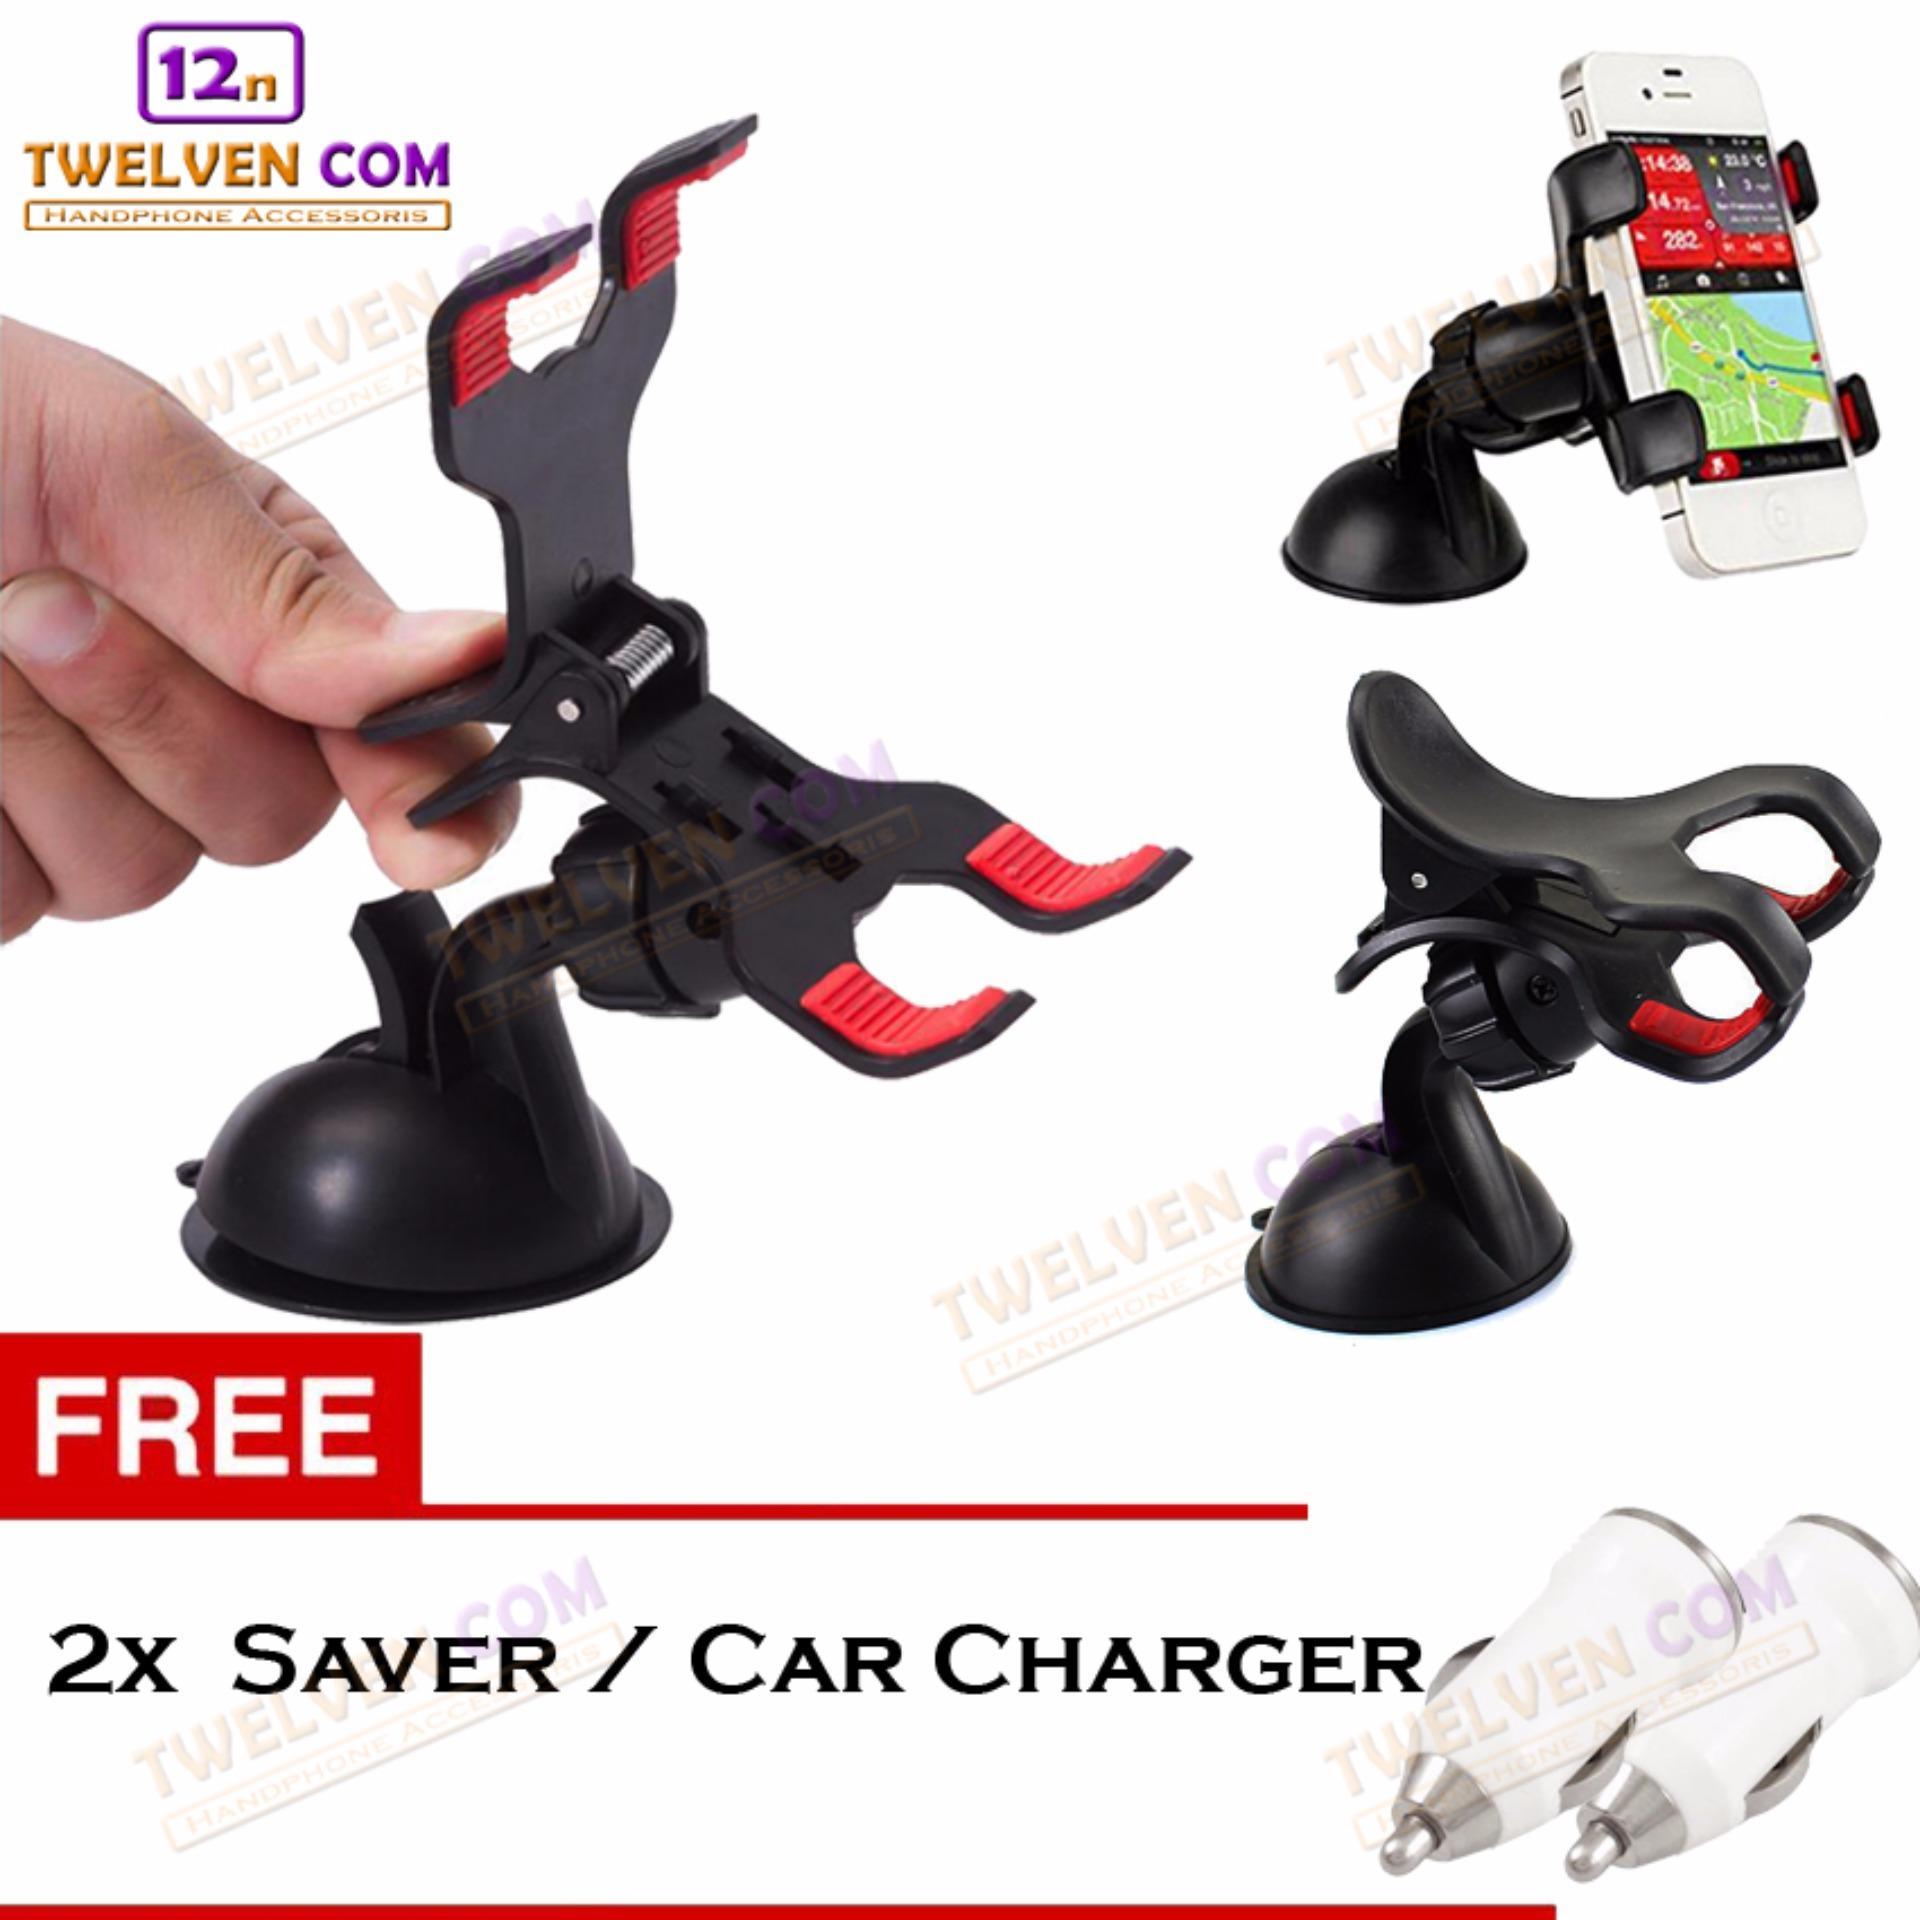 Phone Holder Mobil Universal Untuk HP / GPS - Hitam + Free 2 Pcs Saver / Car Charger